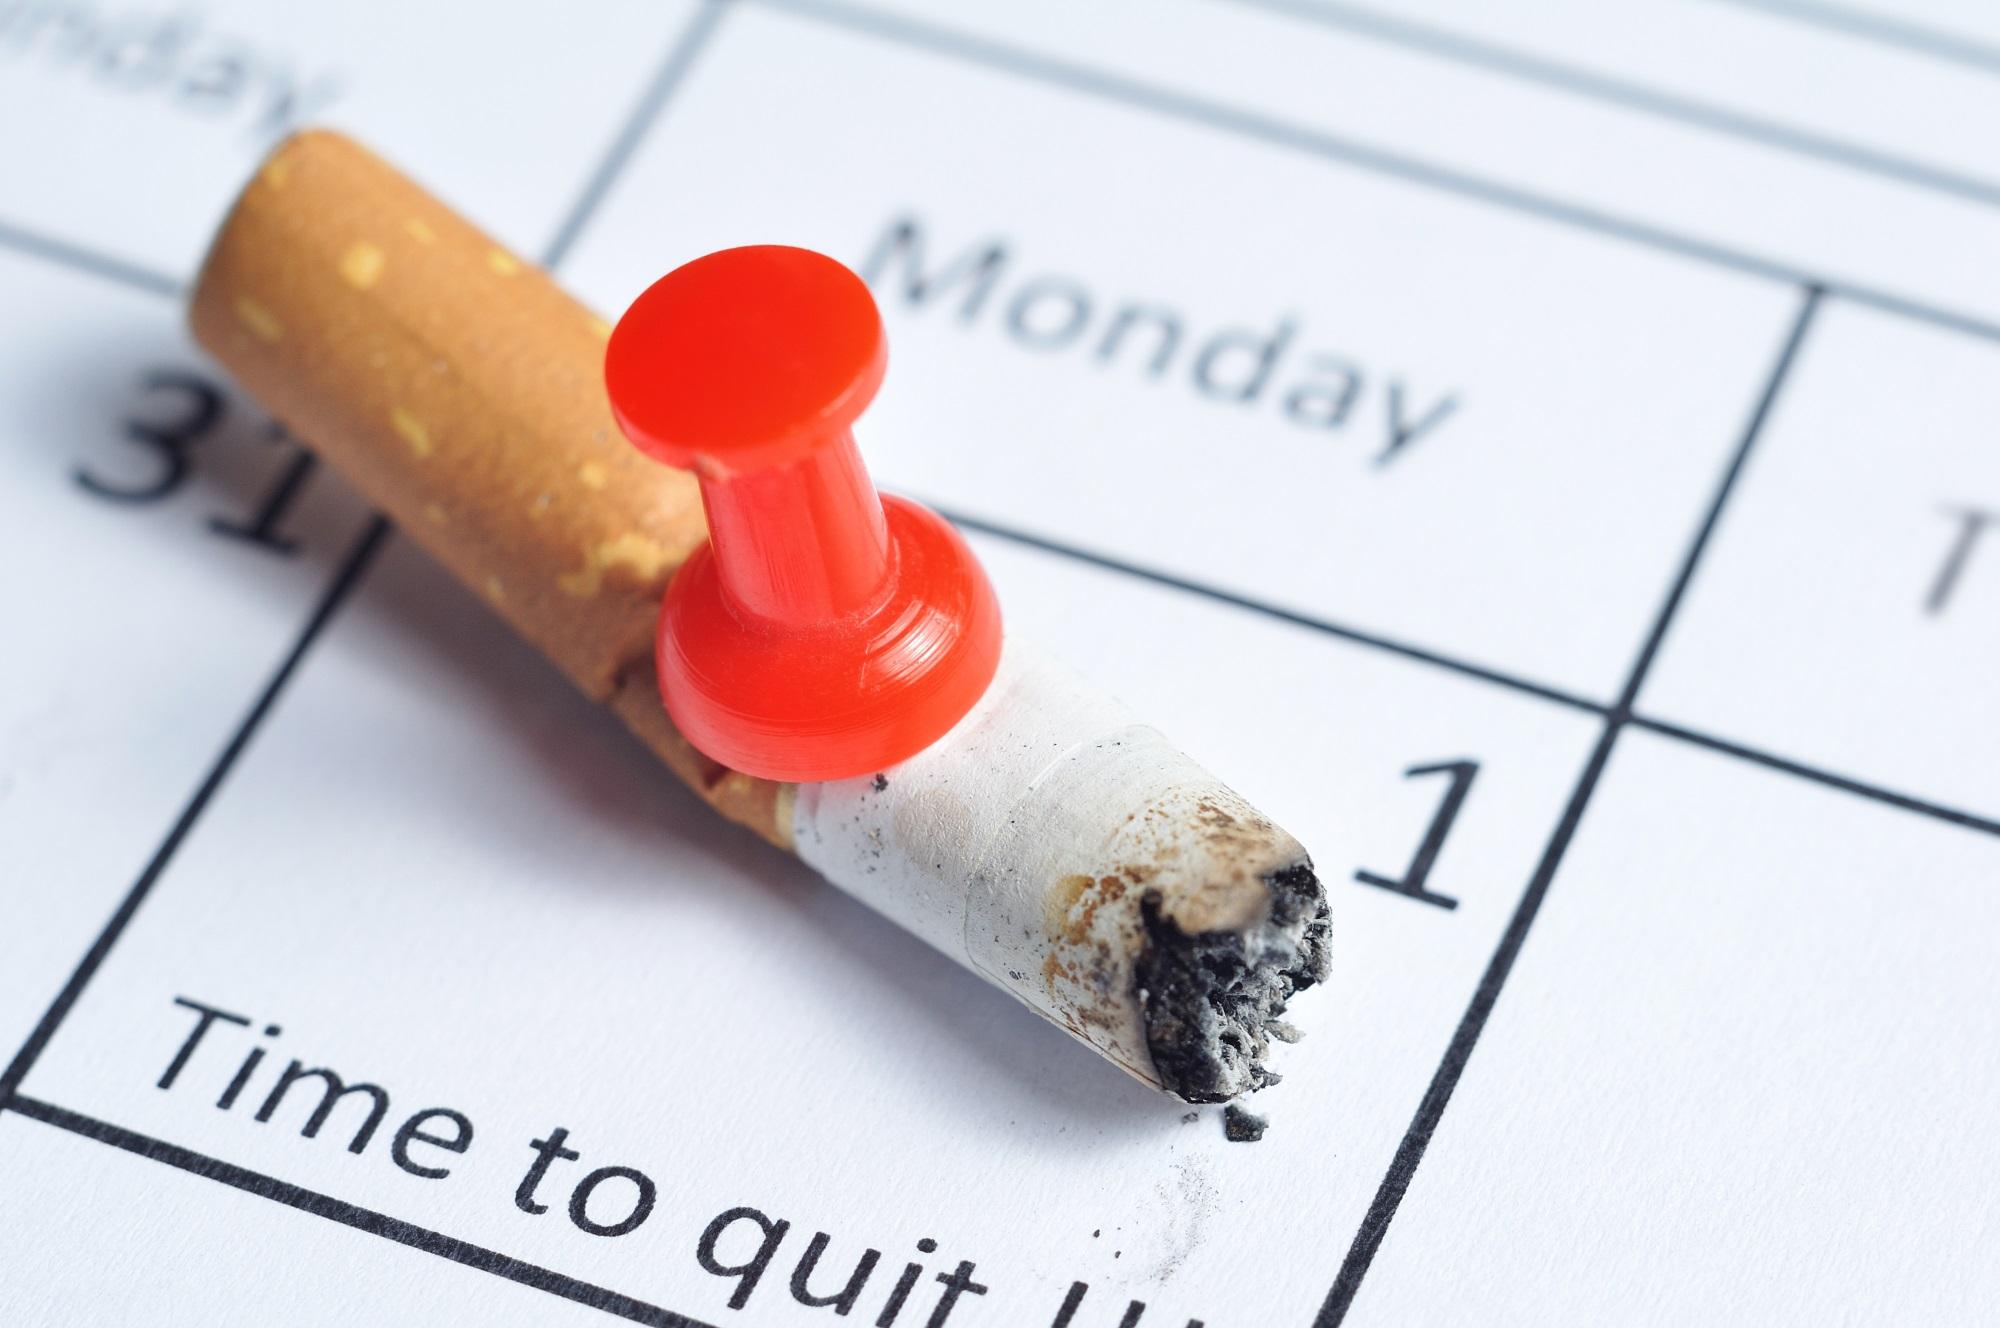 I Want to Quit Smoking. What Do I Do? - Quit Smoking Community